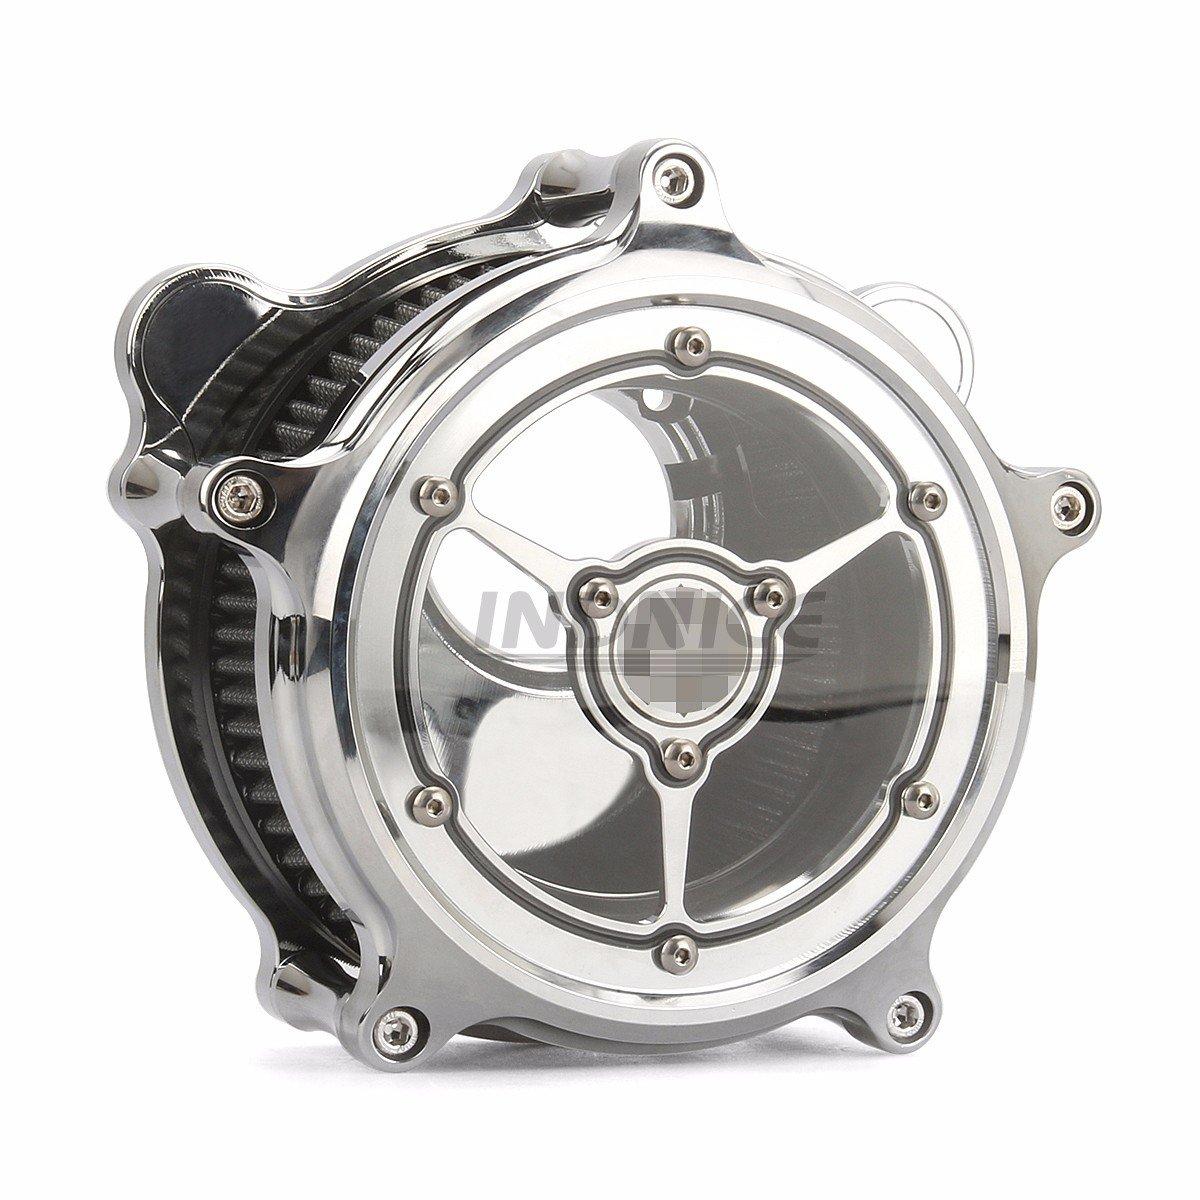 chrome see through RSD clarity Air filters for harley FLHTCU FLHR air filter flhx 08-16,air filter softail 2016-2017   B07CNPRFR2